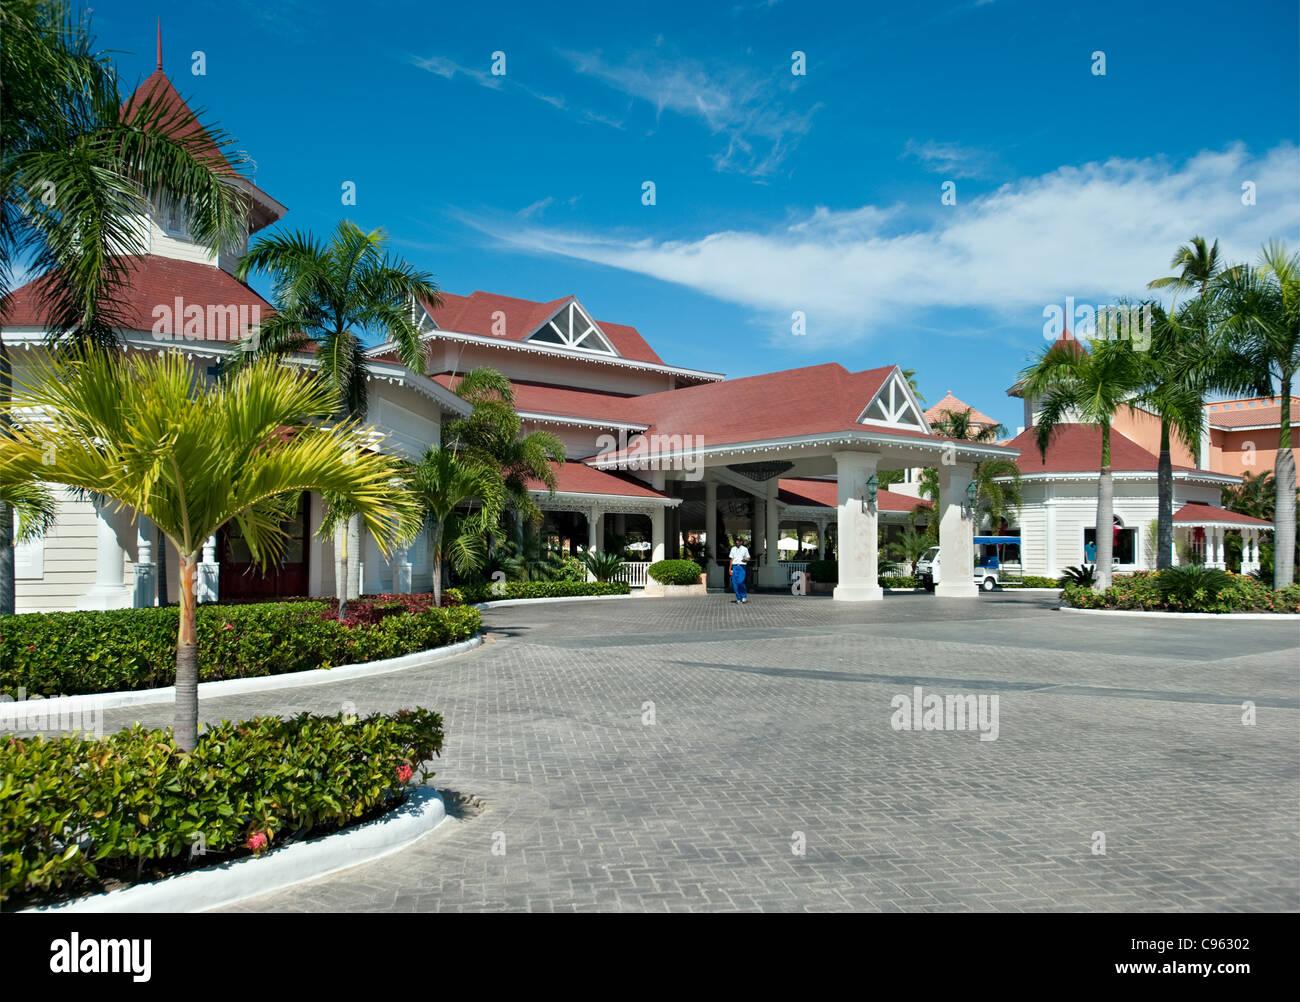 Amber Hotel Gran Bahia Principe Punta Cana, République Dominicaine Photo Stock